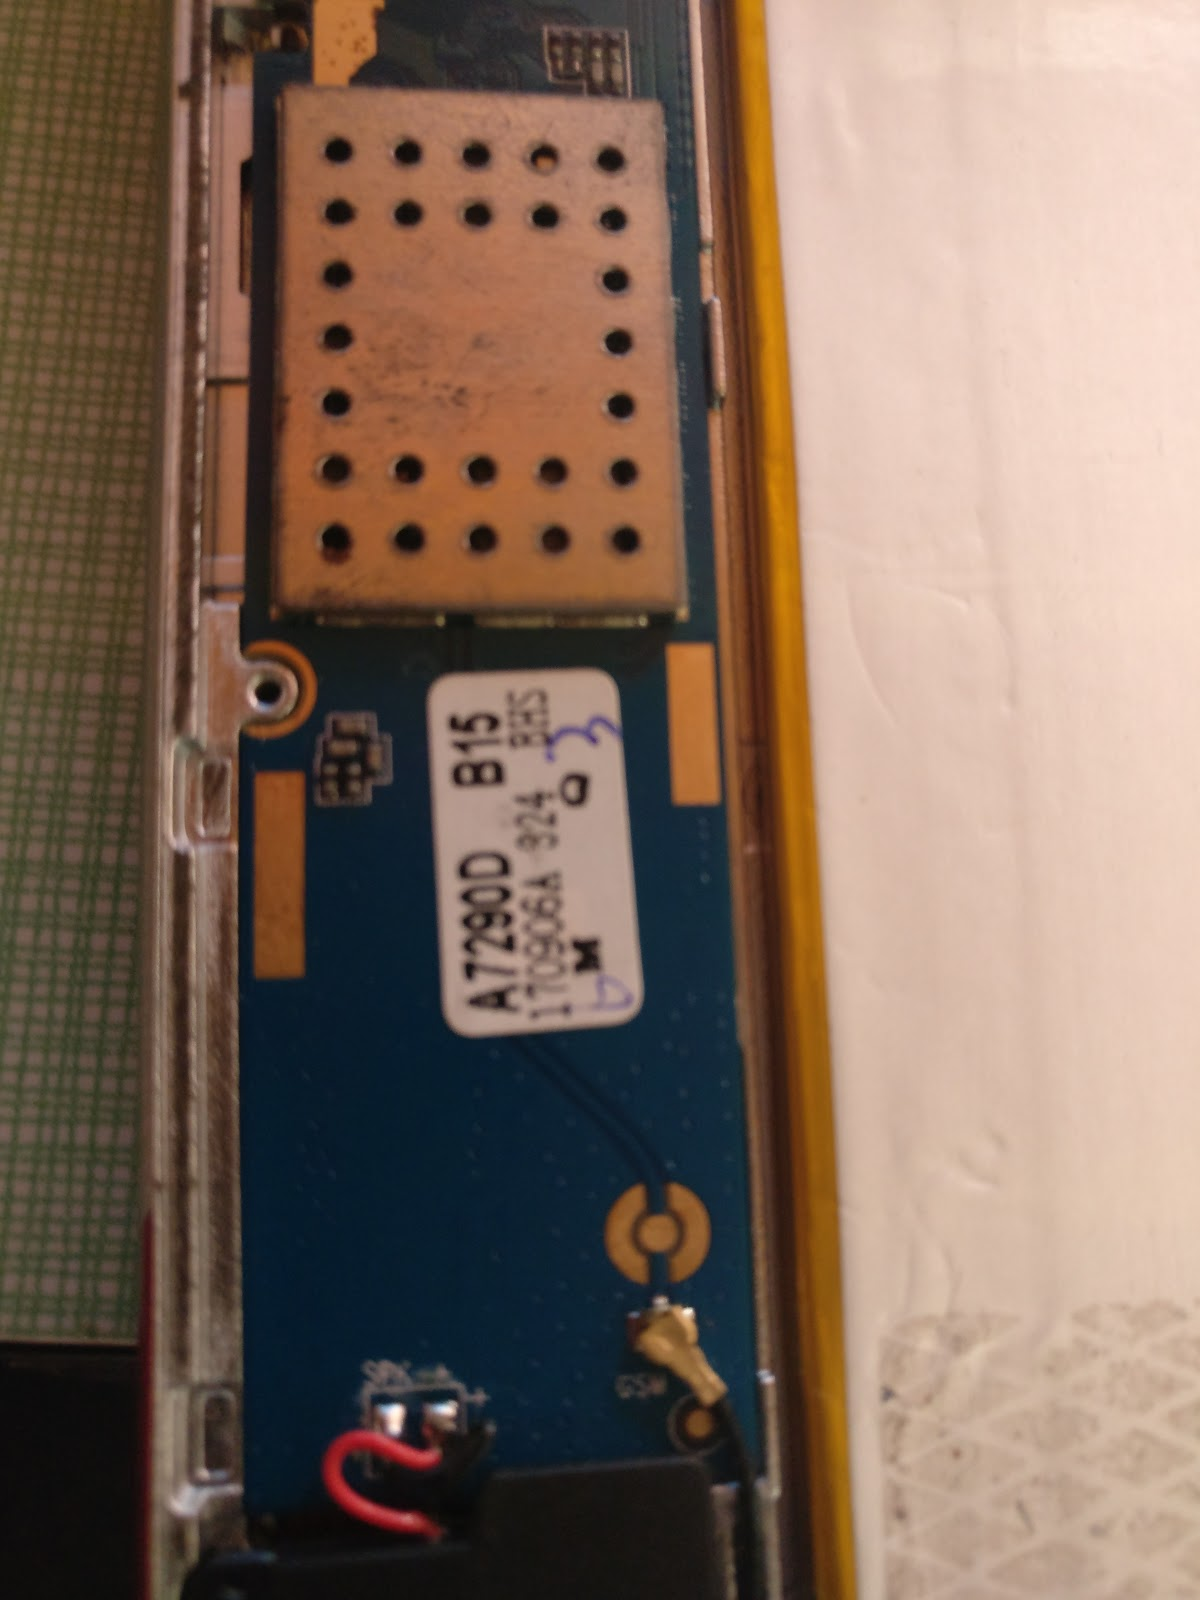 Samsung Galaxy A9 Pro clone MT6572 firmware - www gsmwan com